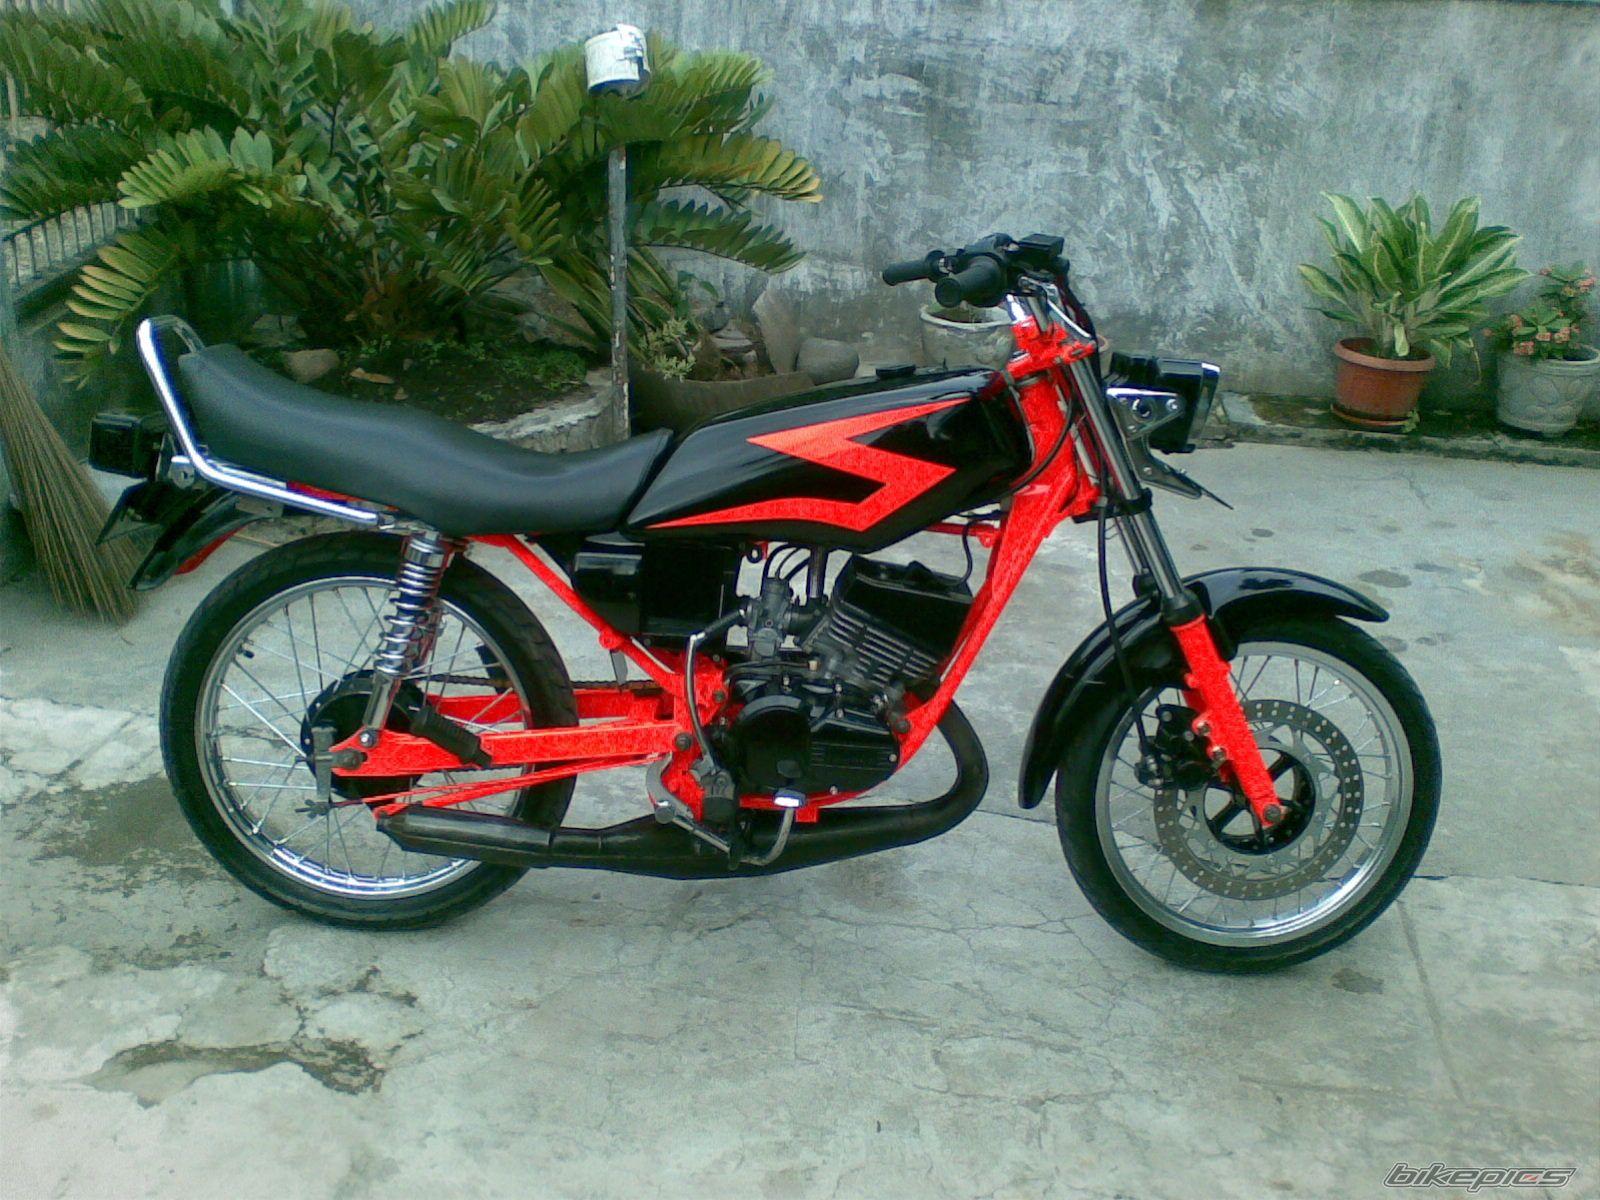 Modifikasi Yamaha Rx King Uring Modifikasi Motor Yamaha